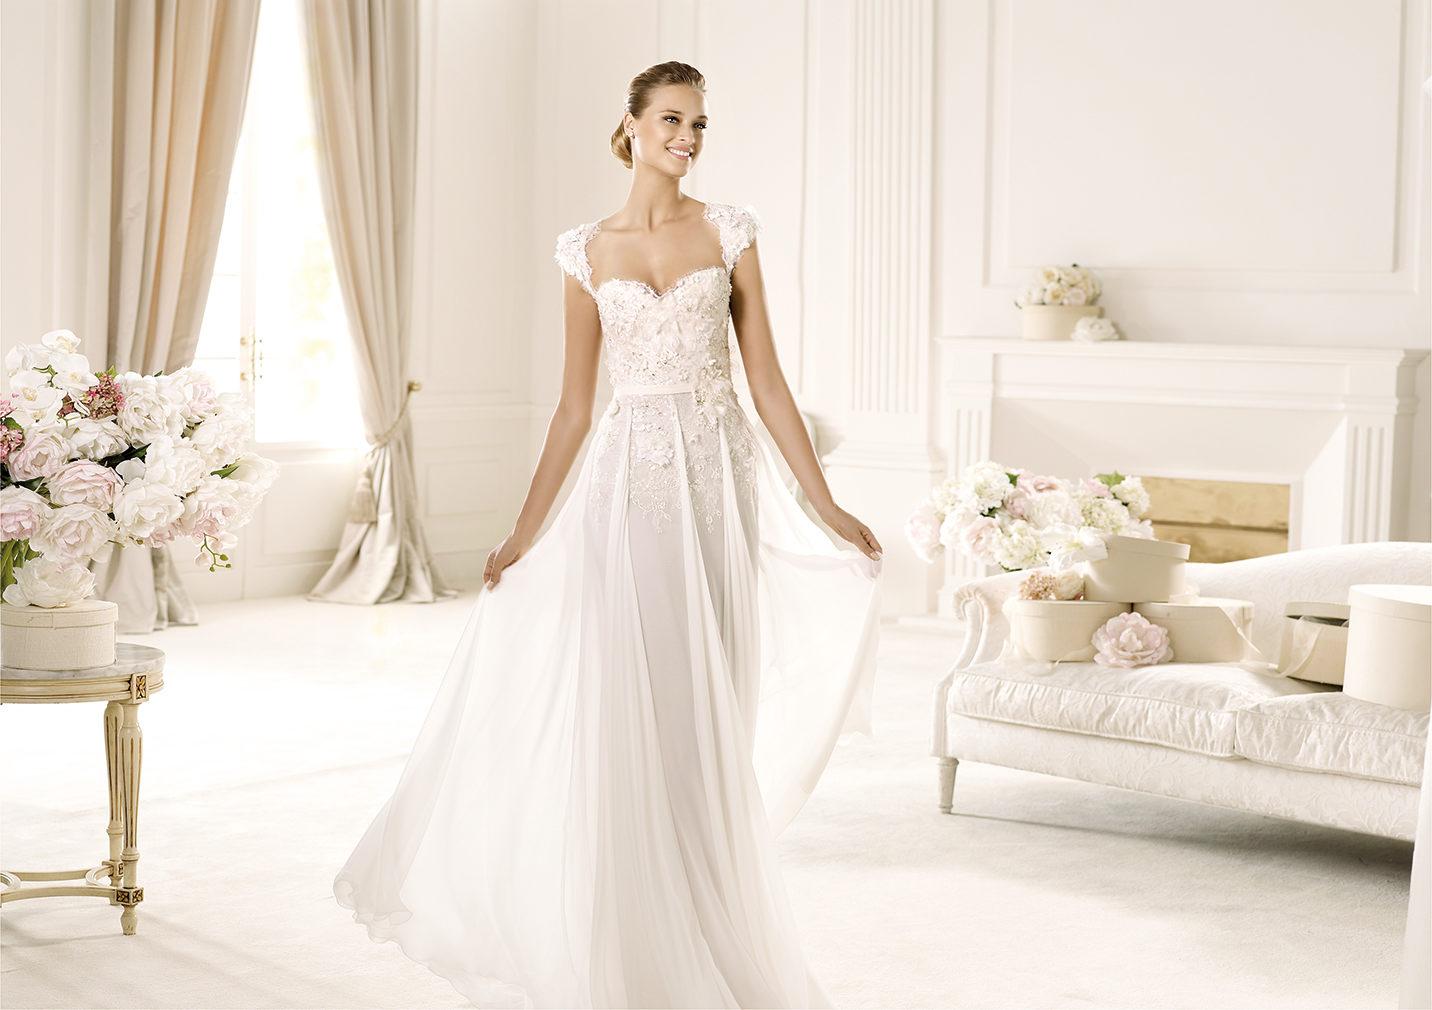 اروع فساتين زفاف 2016